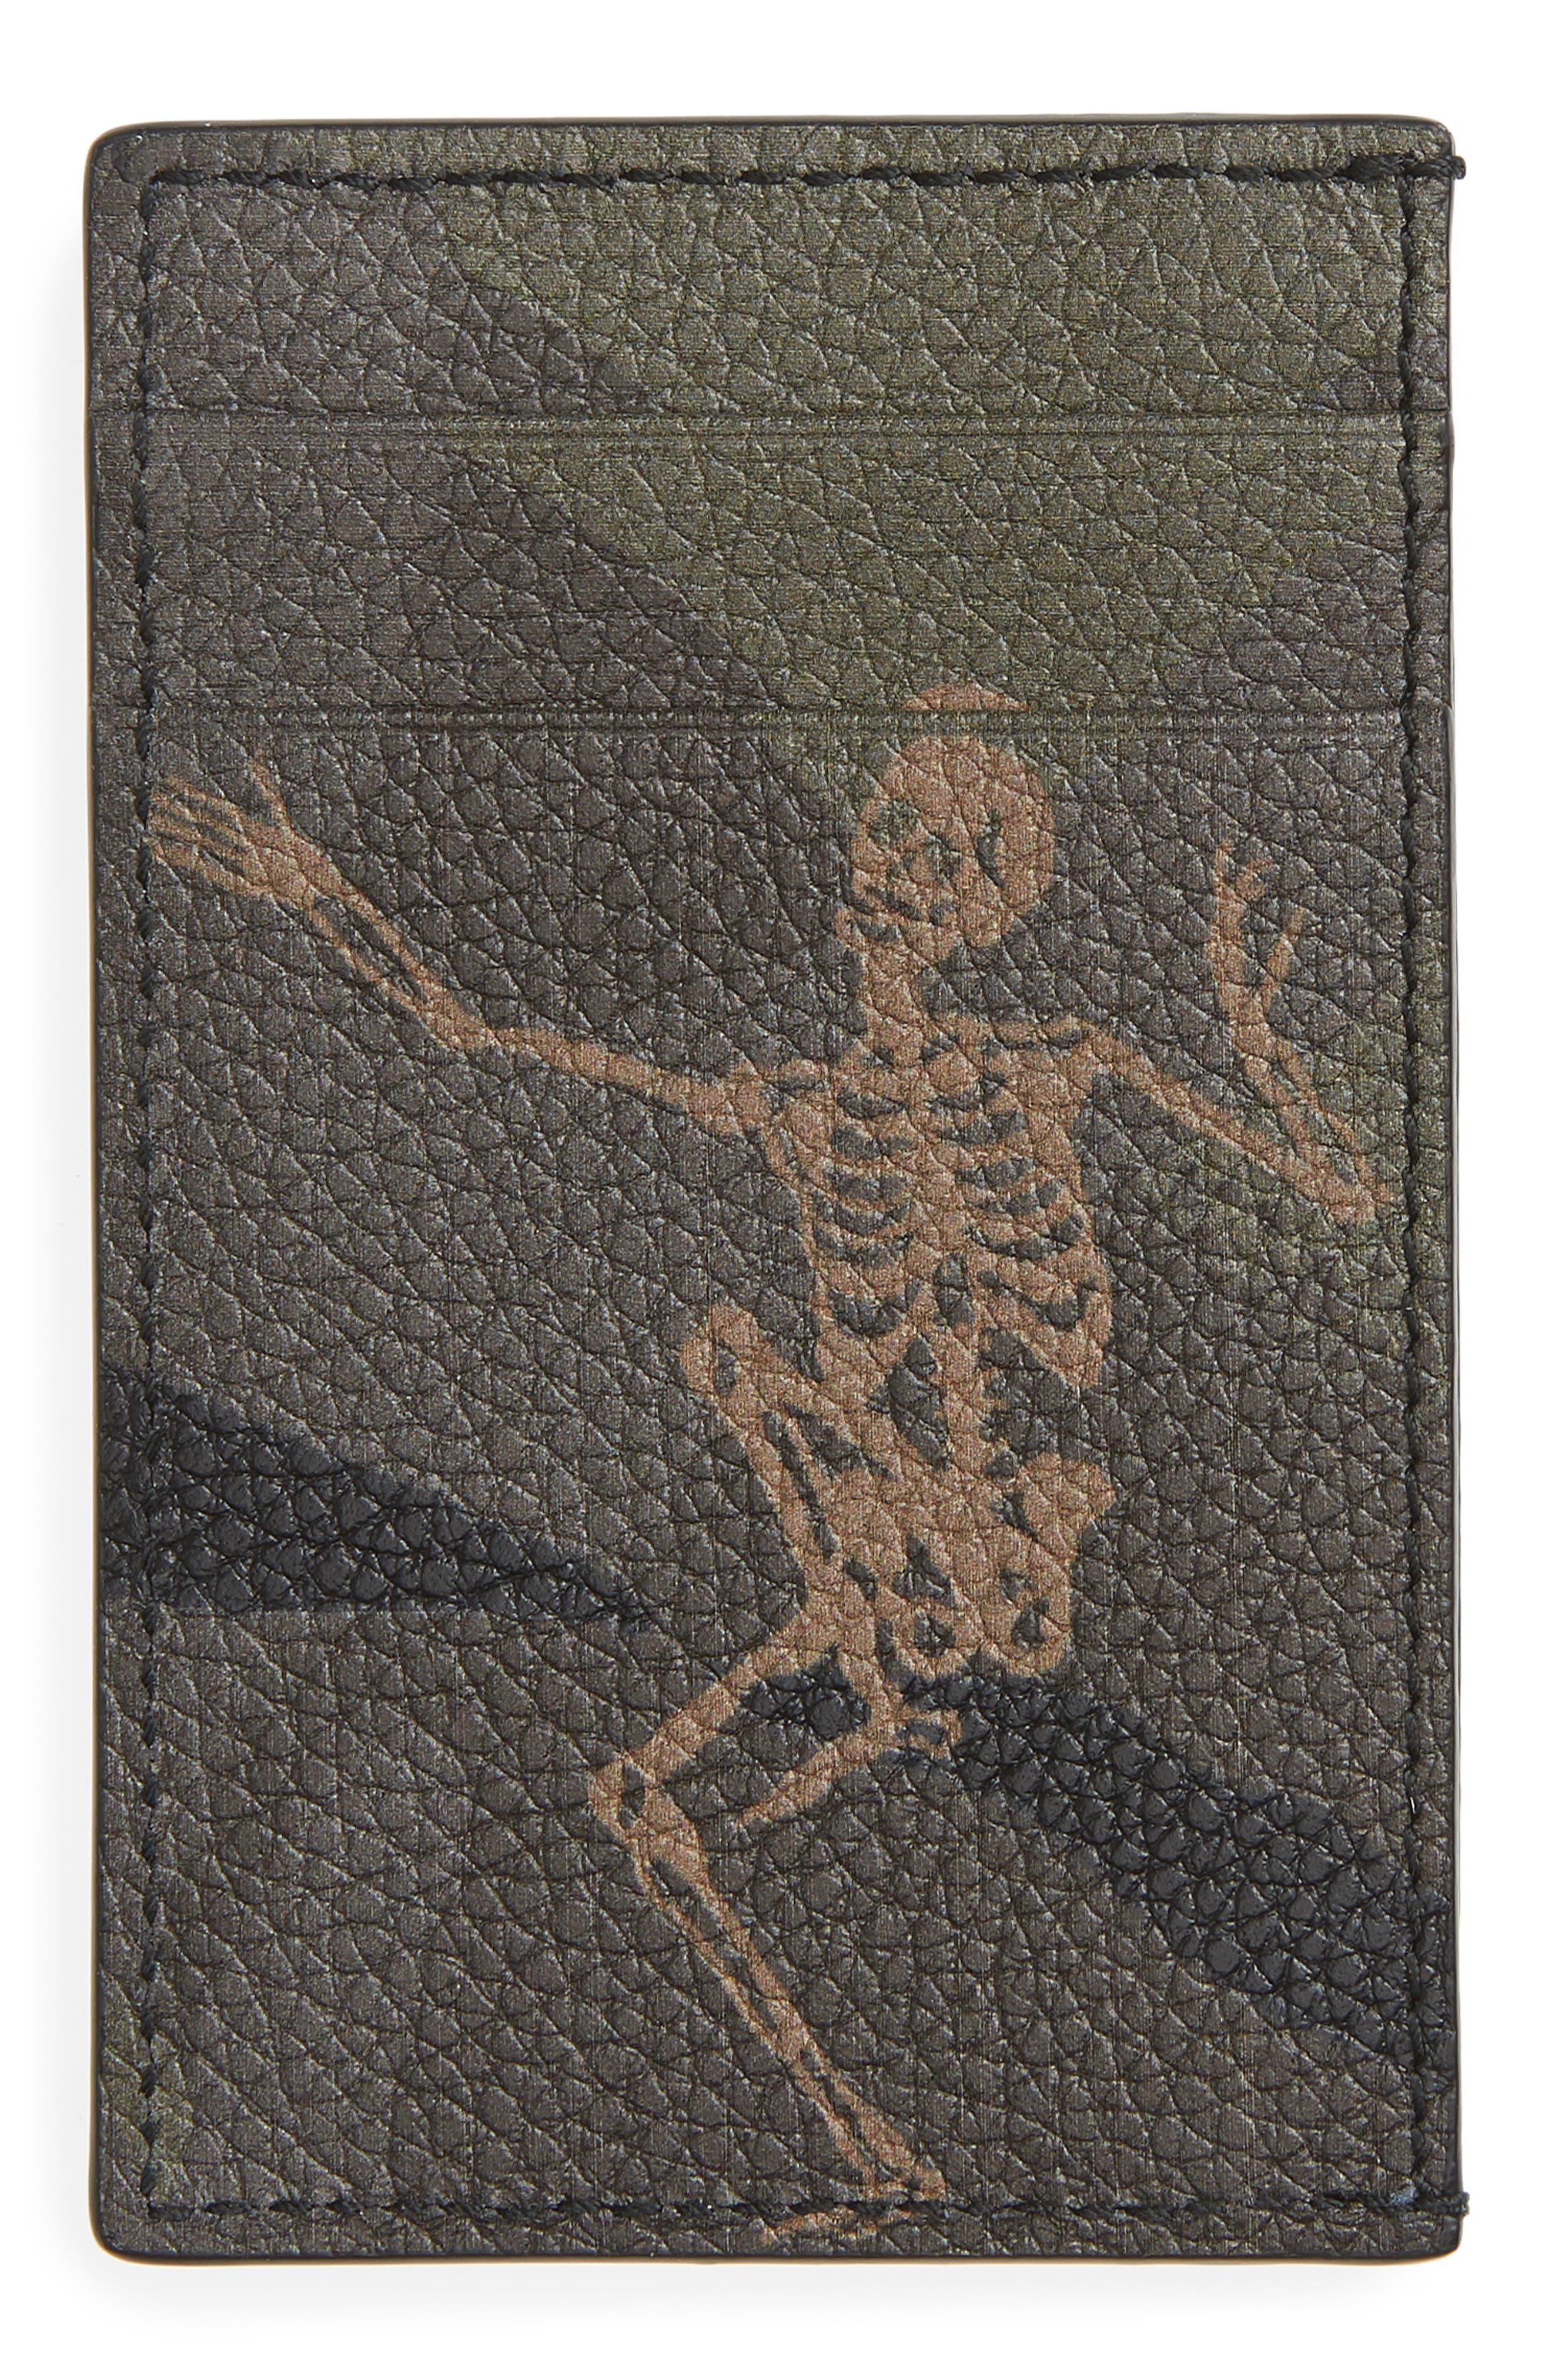 Dancing Skeleton Camo Calfskin Leather Card Case,                             Alternate thumbnail 2, color,                             288